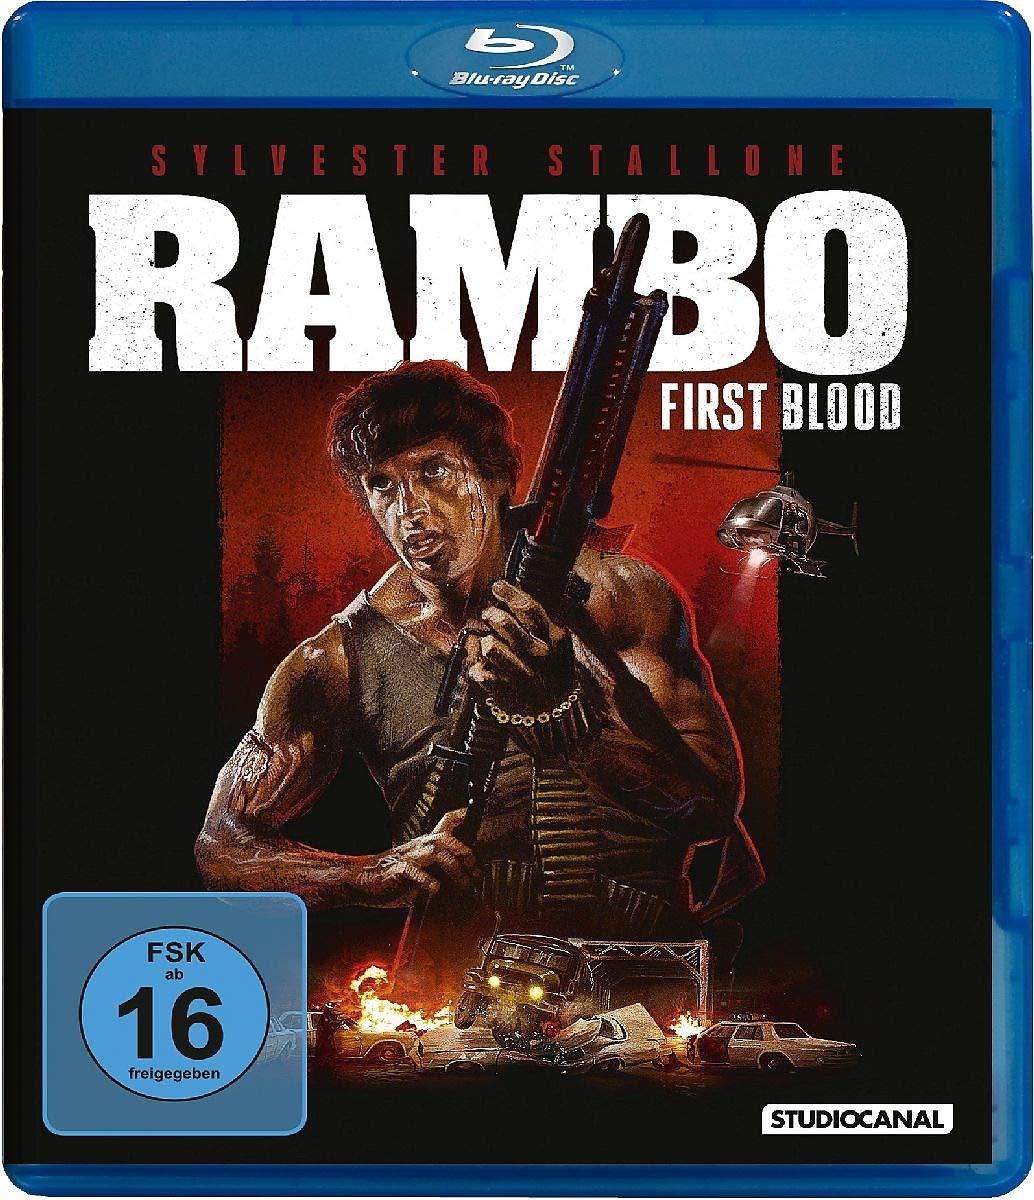 Rambo - First Blood [Italia] [Blu-ray]: Amazon.es: Stallone, Sylvester, Crenna, Richard, Dennehy, Brian, Caruso, David, Starrett, Jack, Kotcheff, Ted, Stallone, Sylvester, Crenna, Richard: Cine y Series TV